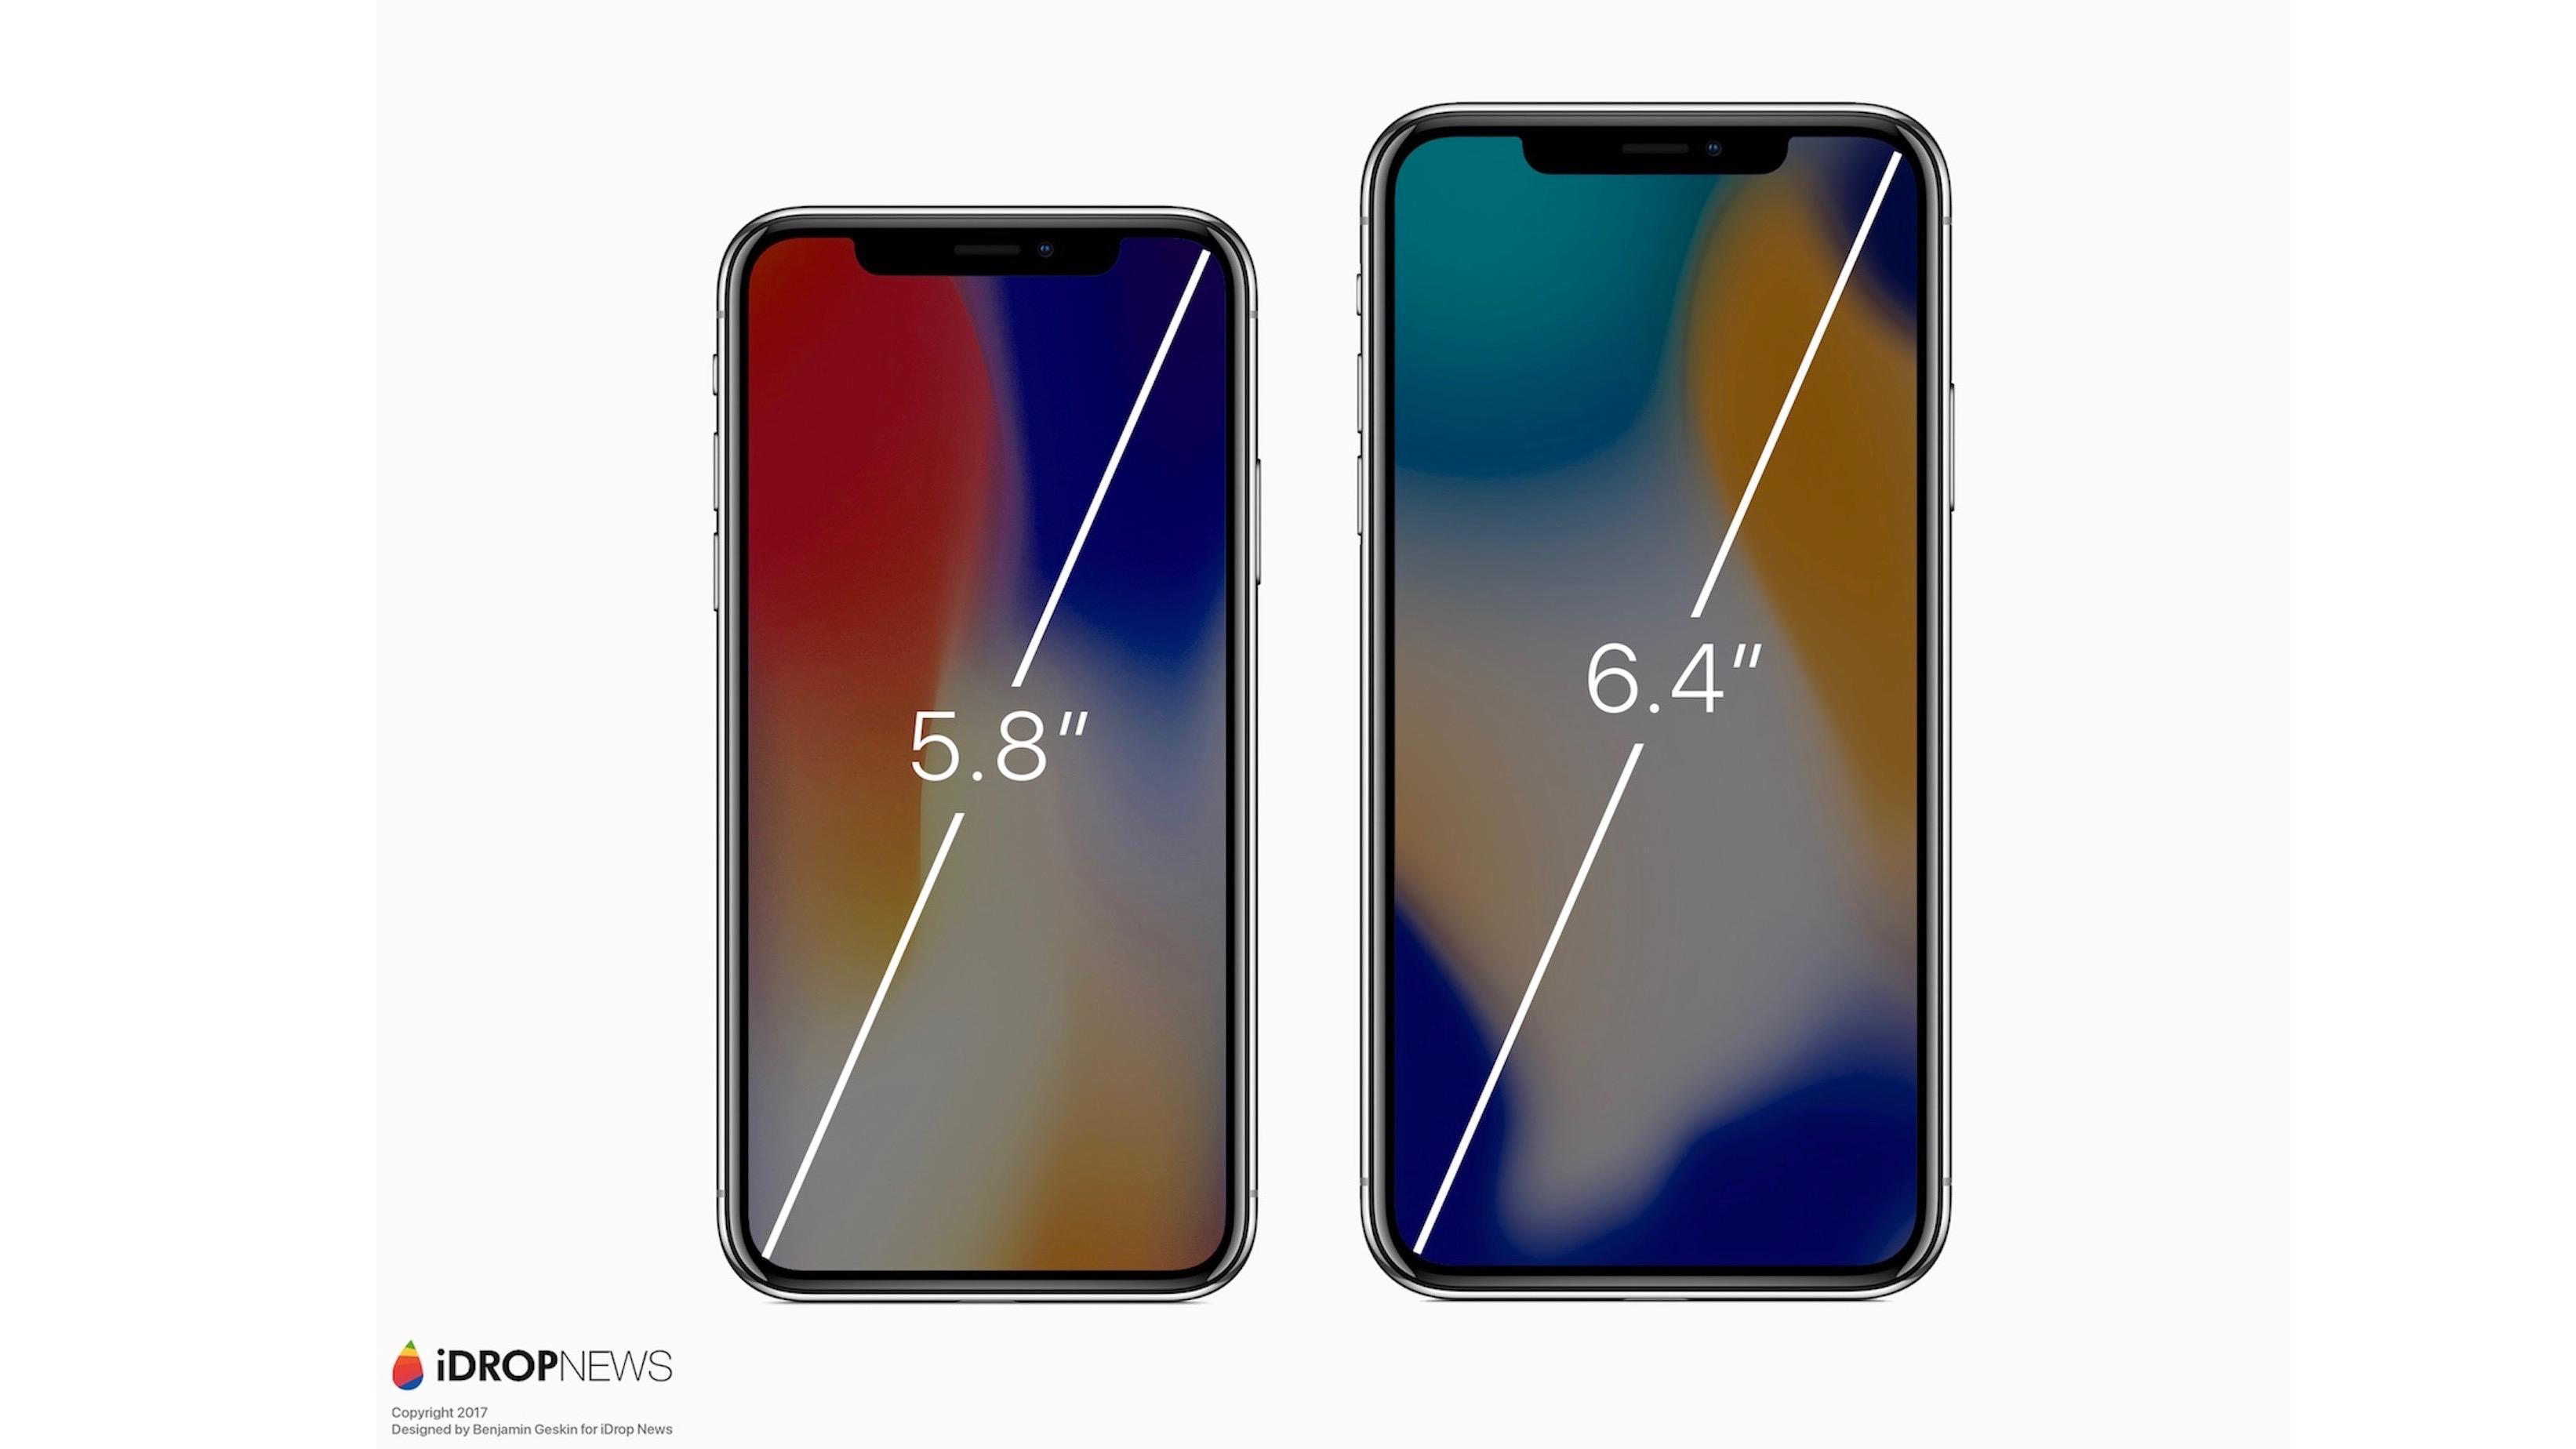 Renders imagine rumored 'iPhone X Plus' with 6.4-inch display [Gallery] - 9to5Mac